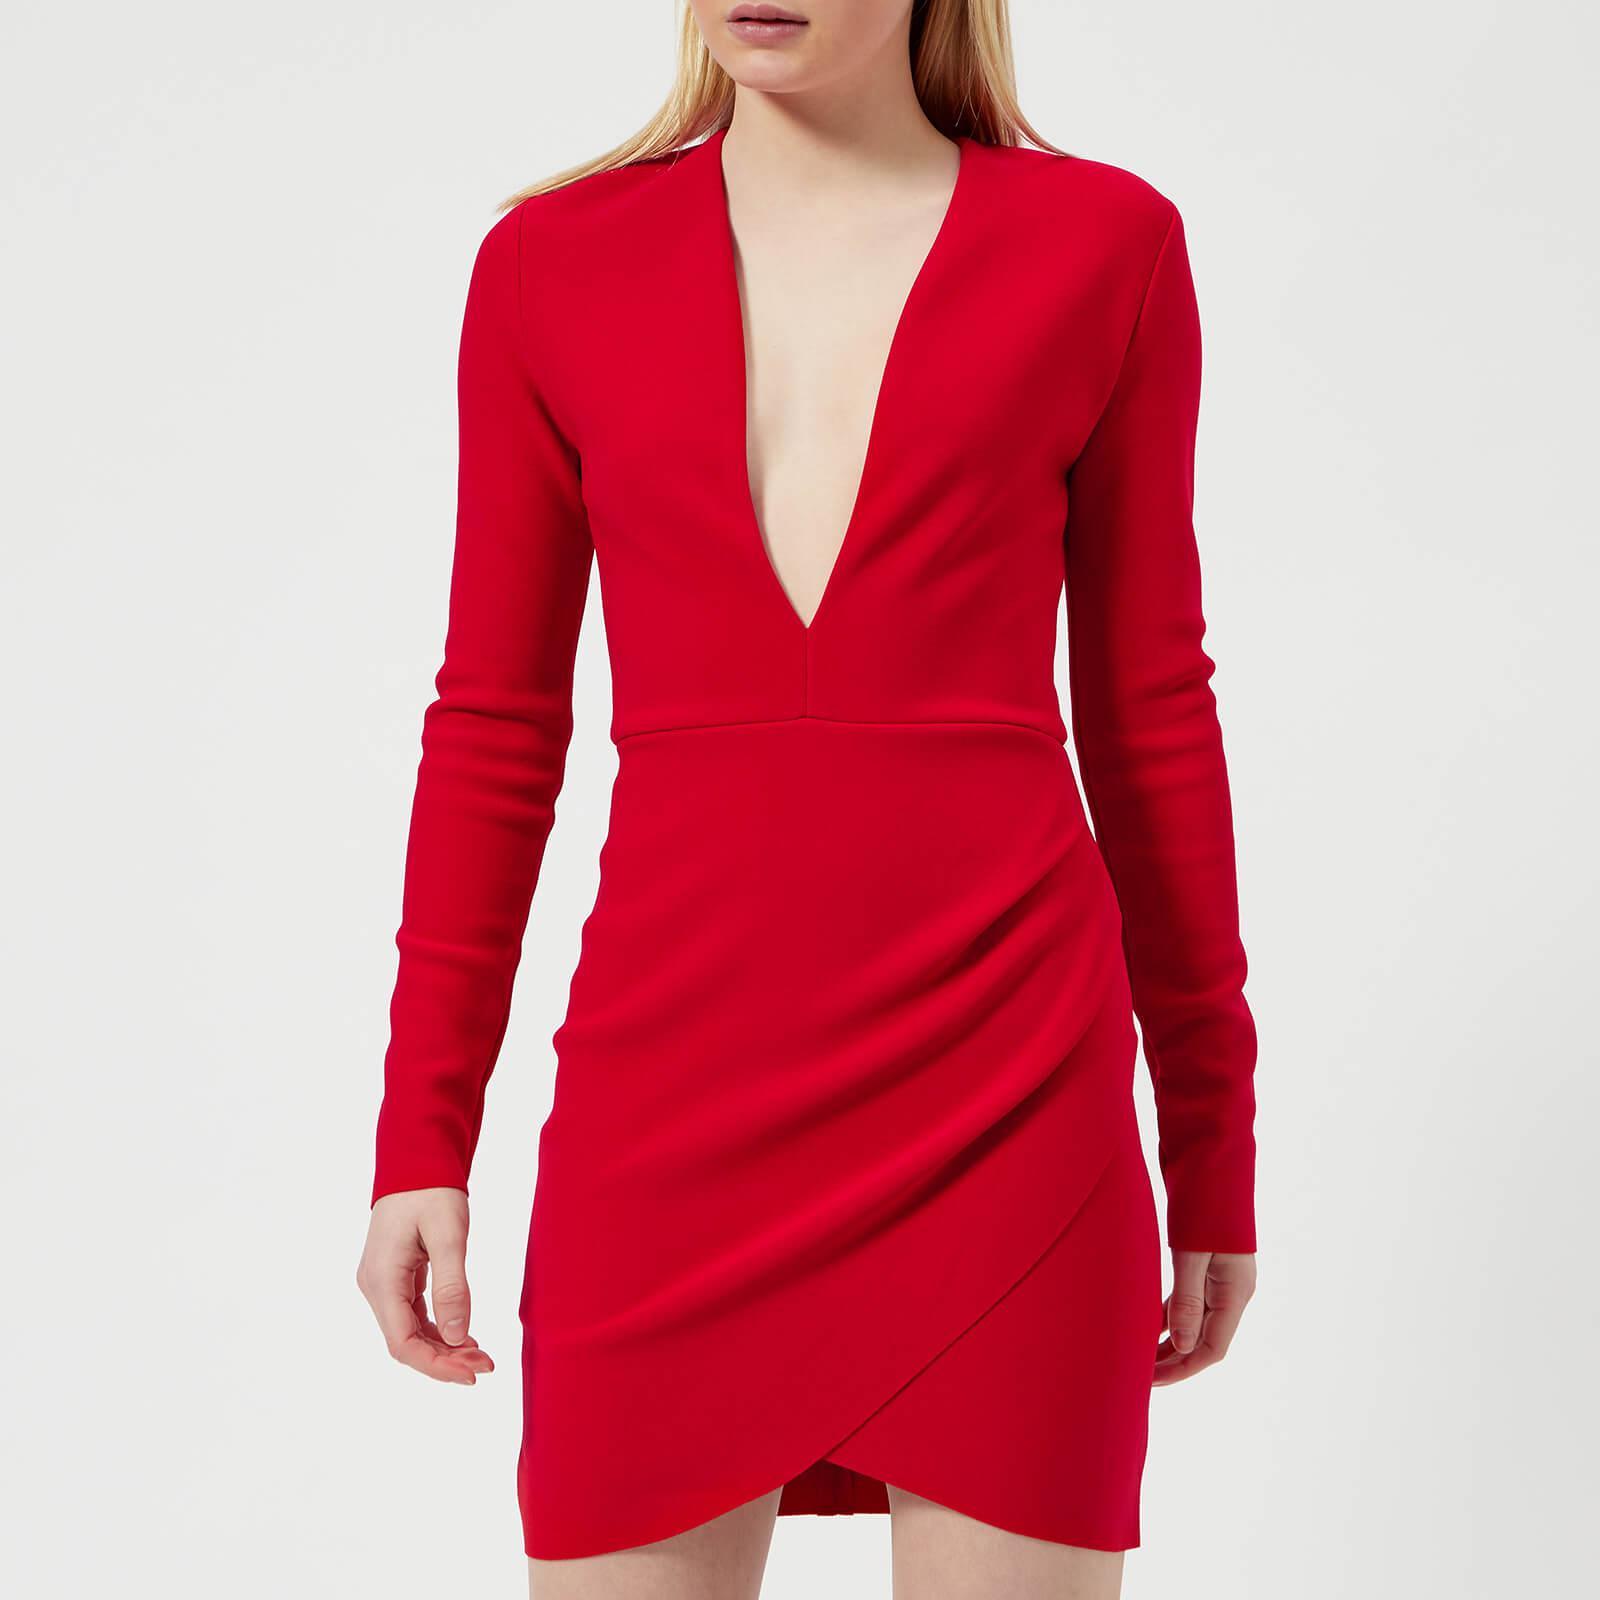 8e66b0f2dd82 Bec & Bridge Marvellous Plunge Dress in Red - Lyst